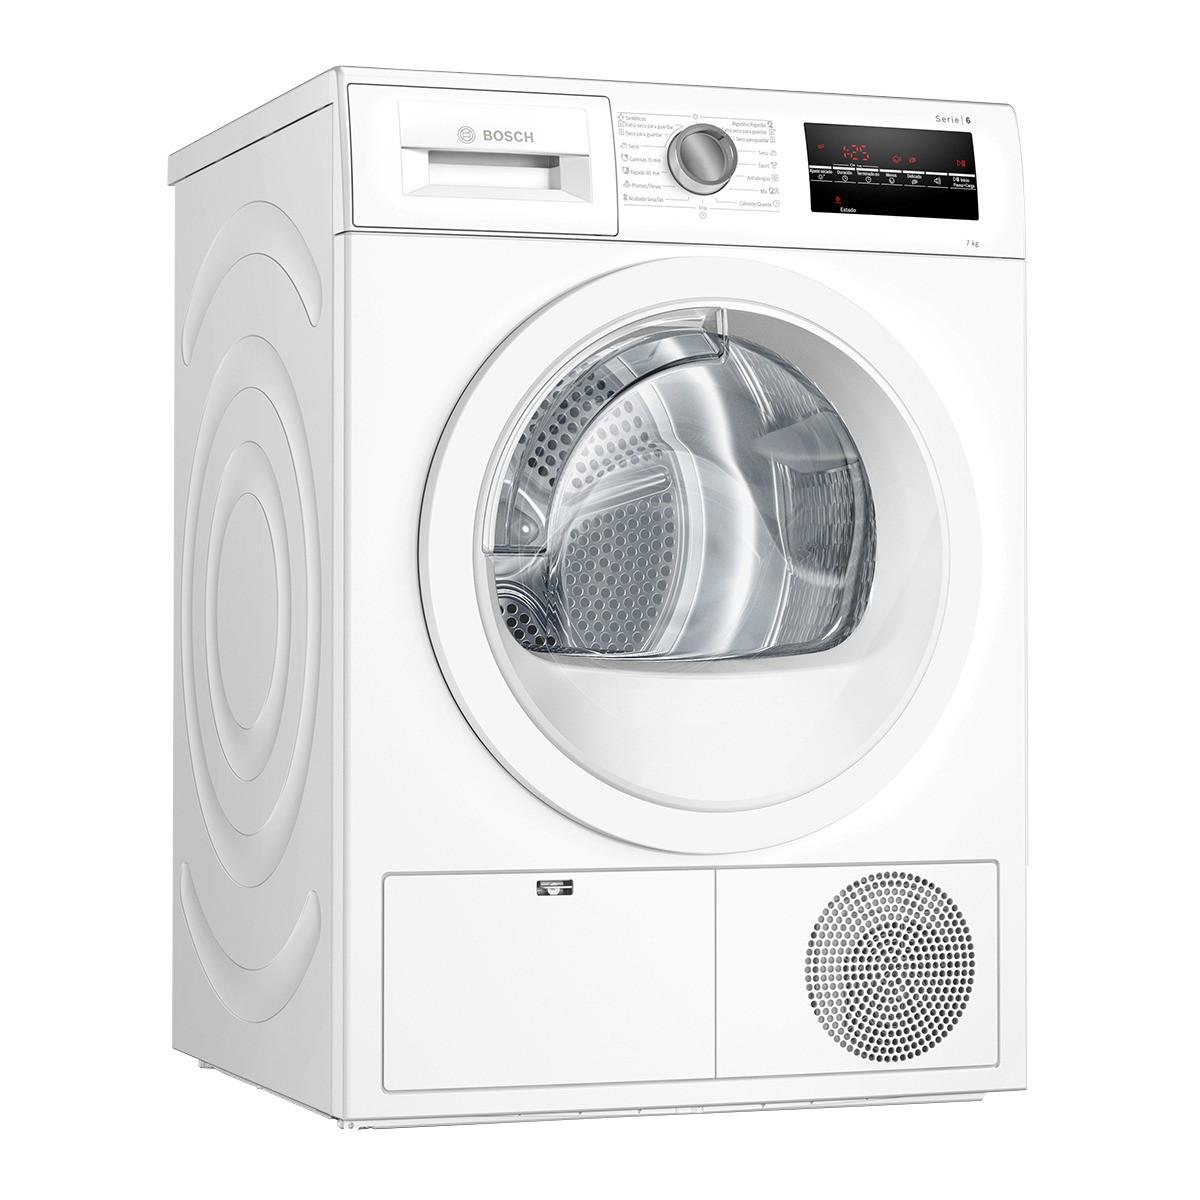 secadora bosch wtg86263es blanco 7kg